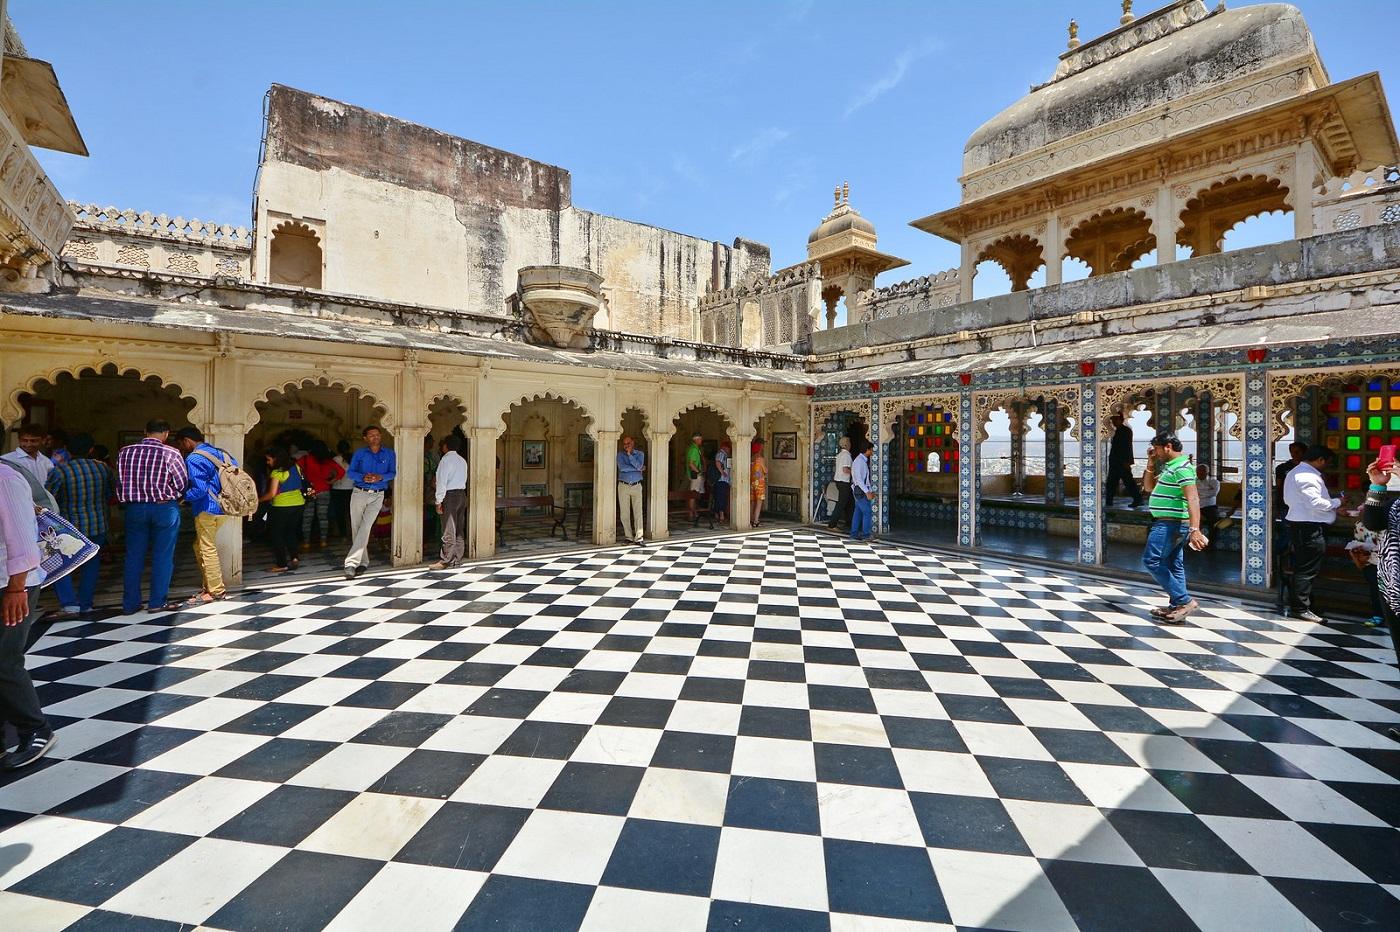 Choti Chitrashali at Udaipur City Palace